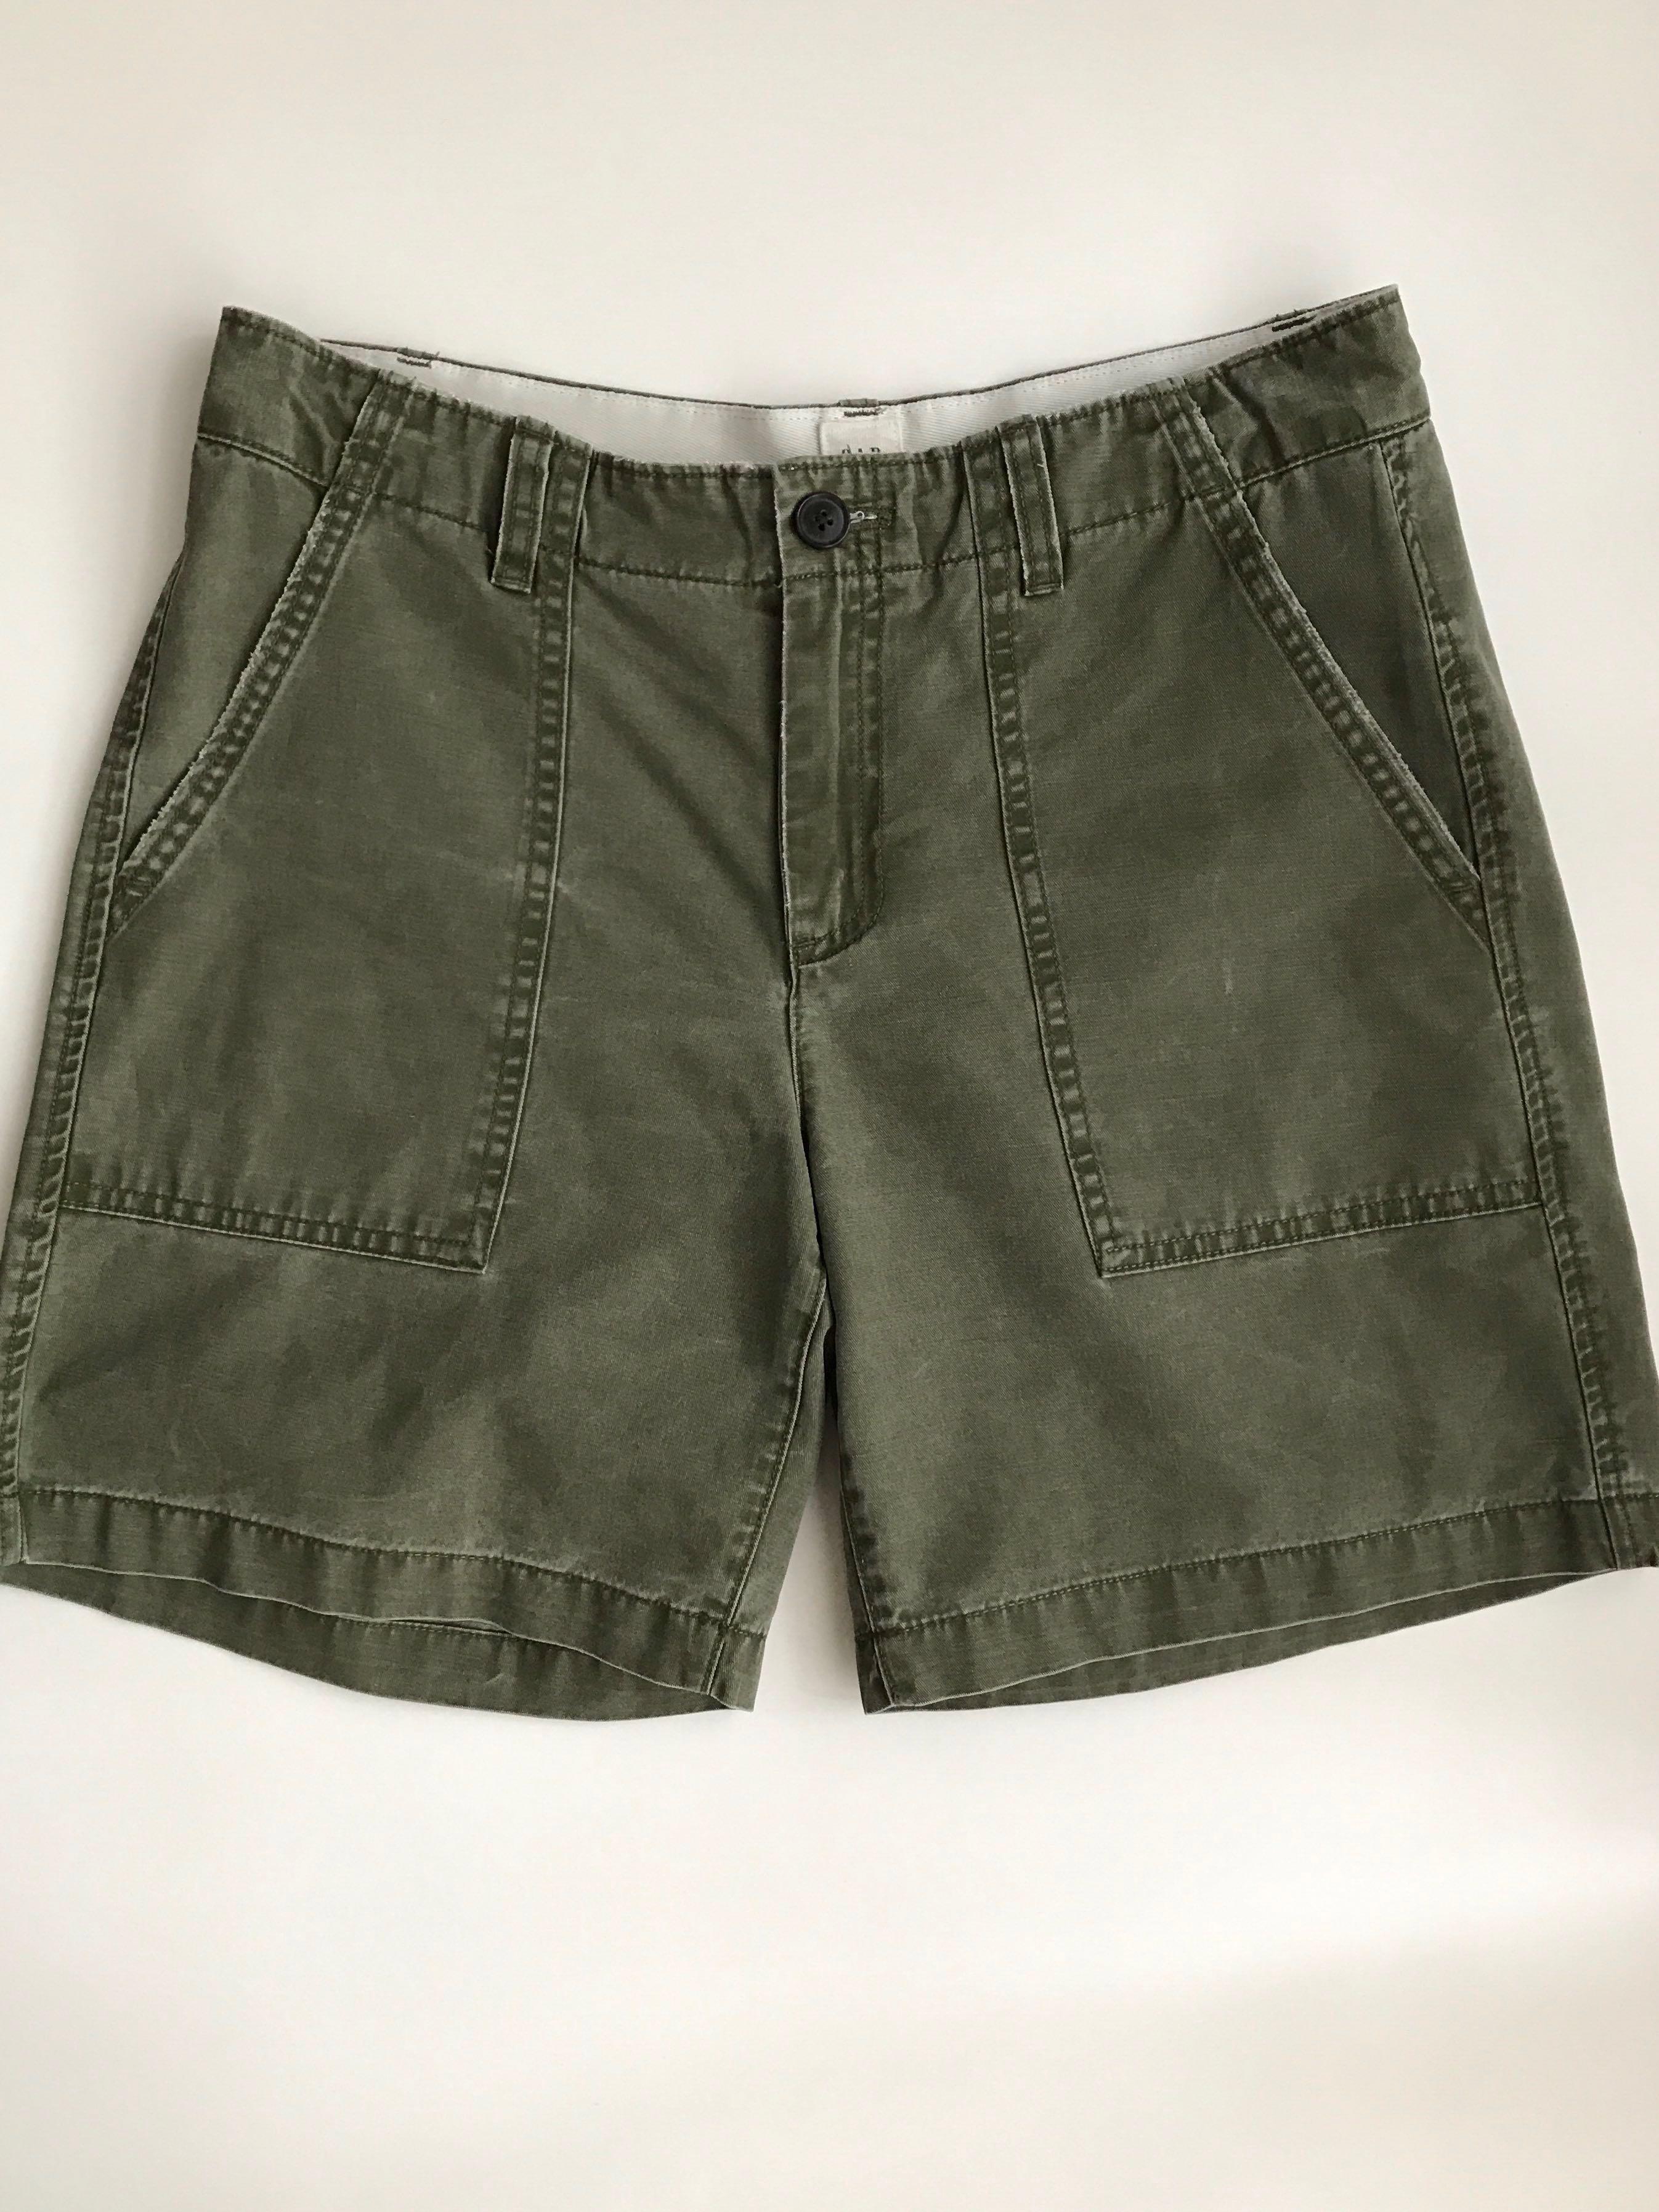 85eb208083 Gap girlfriend chino shorts, size US2, Women's Fashion, Clothes, Pants,  Jeans & Shorts on Carousell